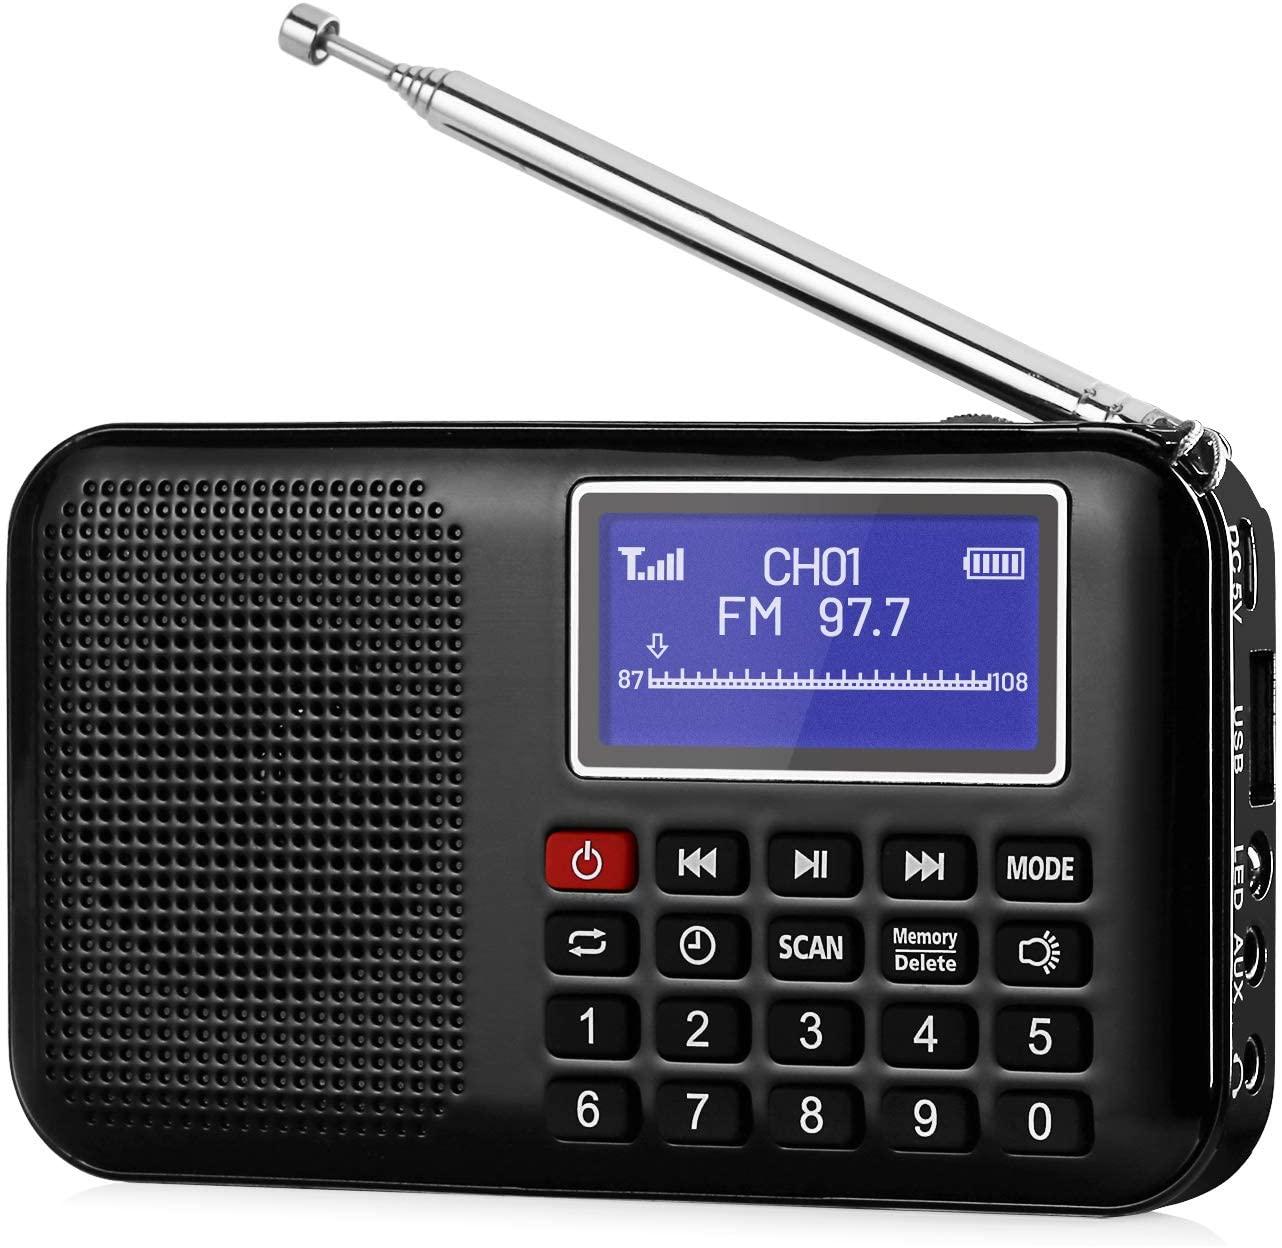 Raddy RF28 Portable FM Pocket Radio Speaker AUX MP3 USB Music Player, Battery Operated, Digital Tuning with Flashlight, Sleep Timer, Support TF Card (Black)